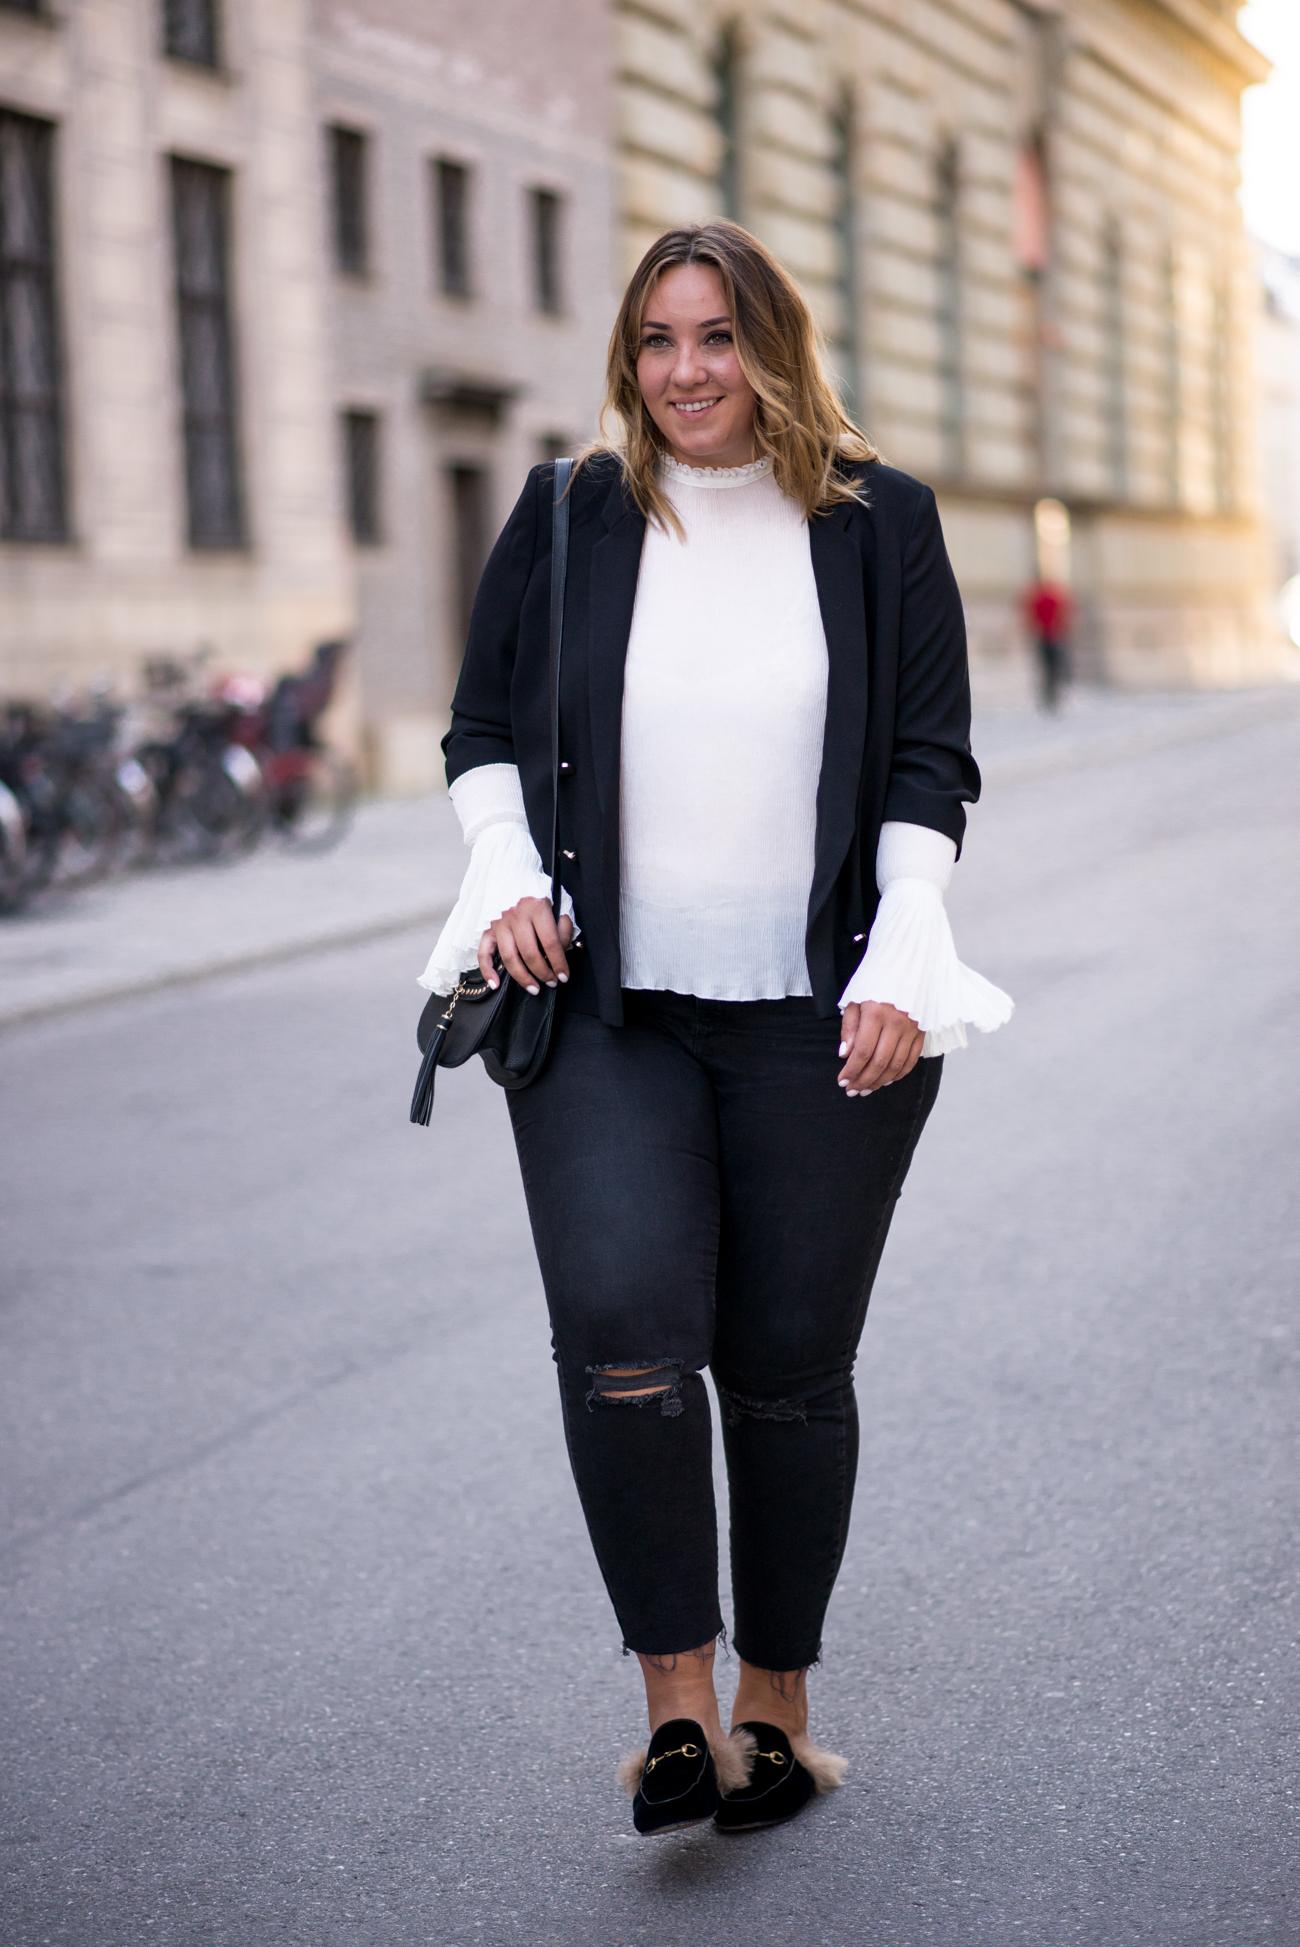 gucci-slipper_gucci-princetown_skinny-and-the-curvy-one_plus_plus-size-blogger_fashion_blogger-deutschland_fashionblogger-munich_curve-8-von-21